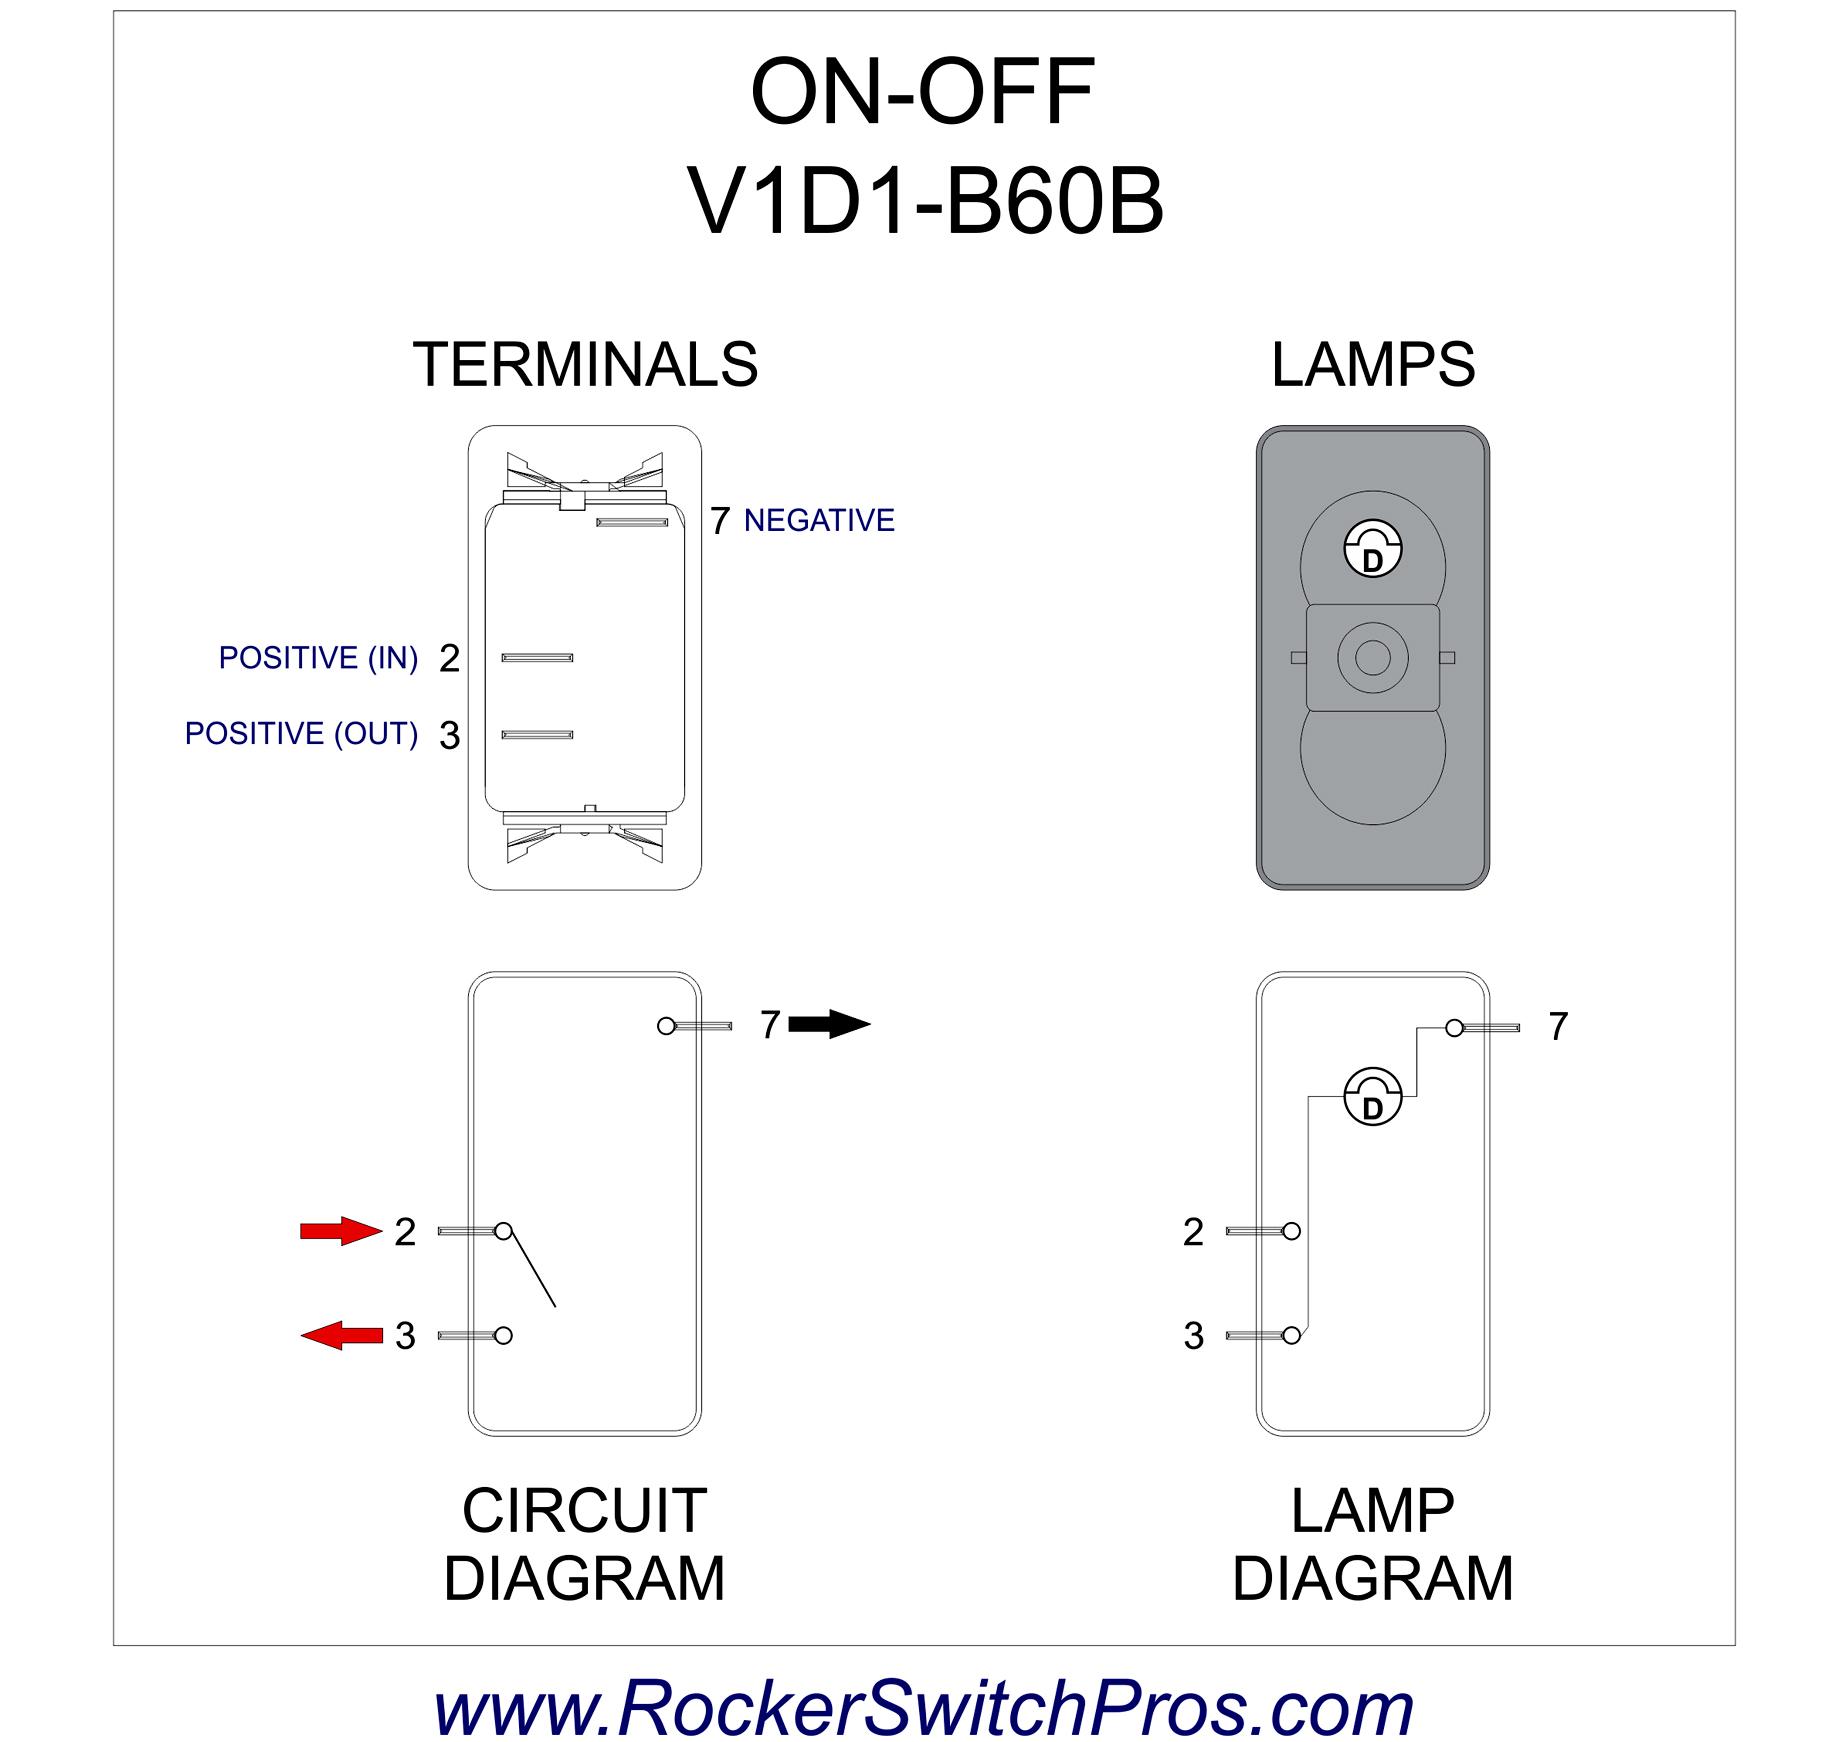 V1D1 B60B wiring diagram1?resize=665%2C628&ssl=1 lr39145 toggle switch wiring diagram wiring diagram lr39145 toggle switch wiring diagram at bakdesigns.co